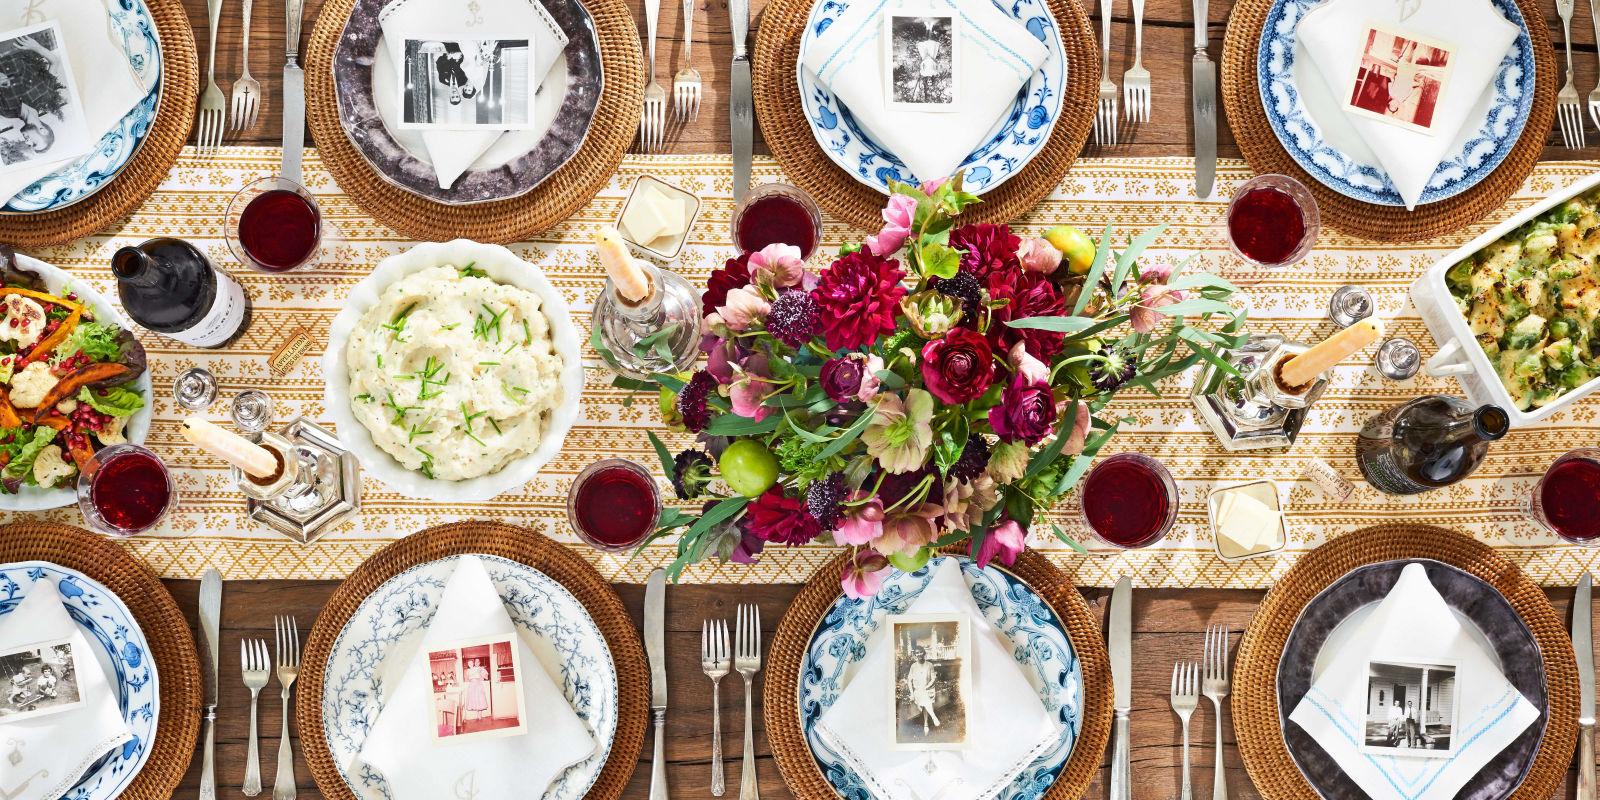 40 thanksgiving table settings thanksgiving tablescapes decoration ideas - Thanksgiving table setting ideas ...